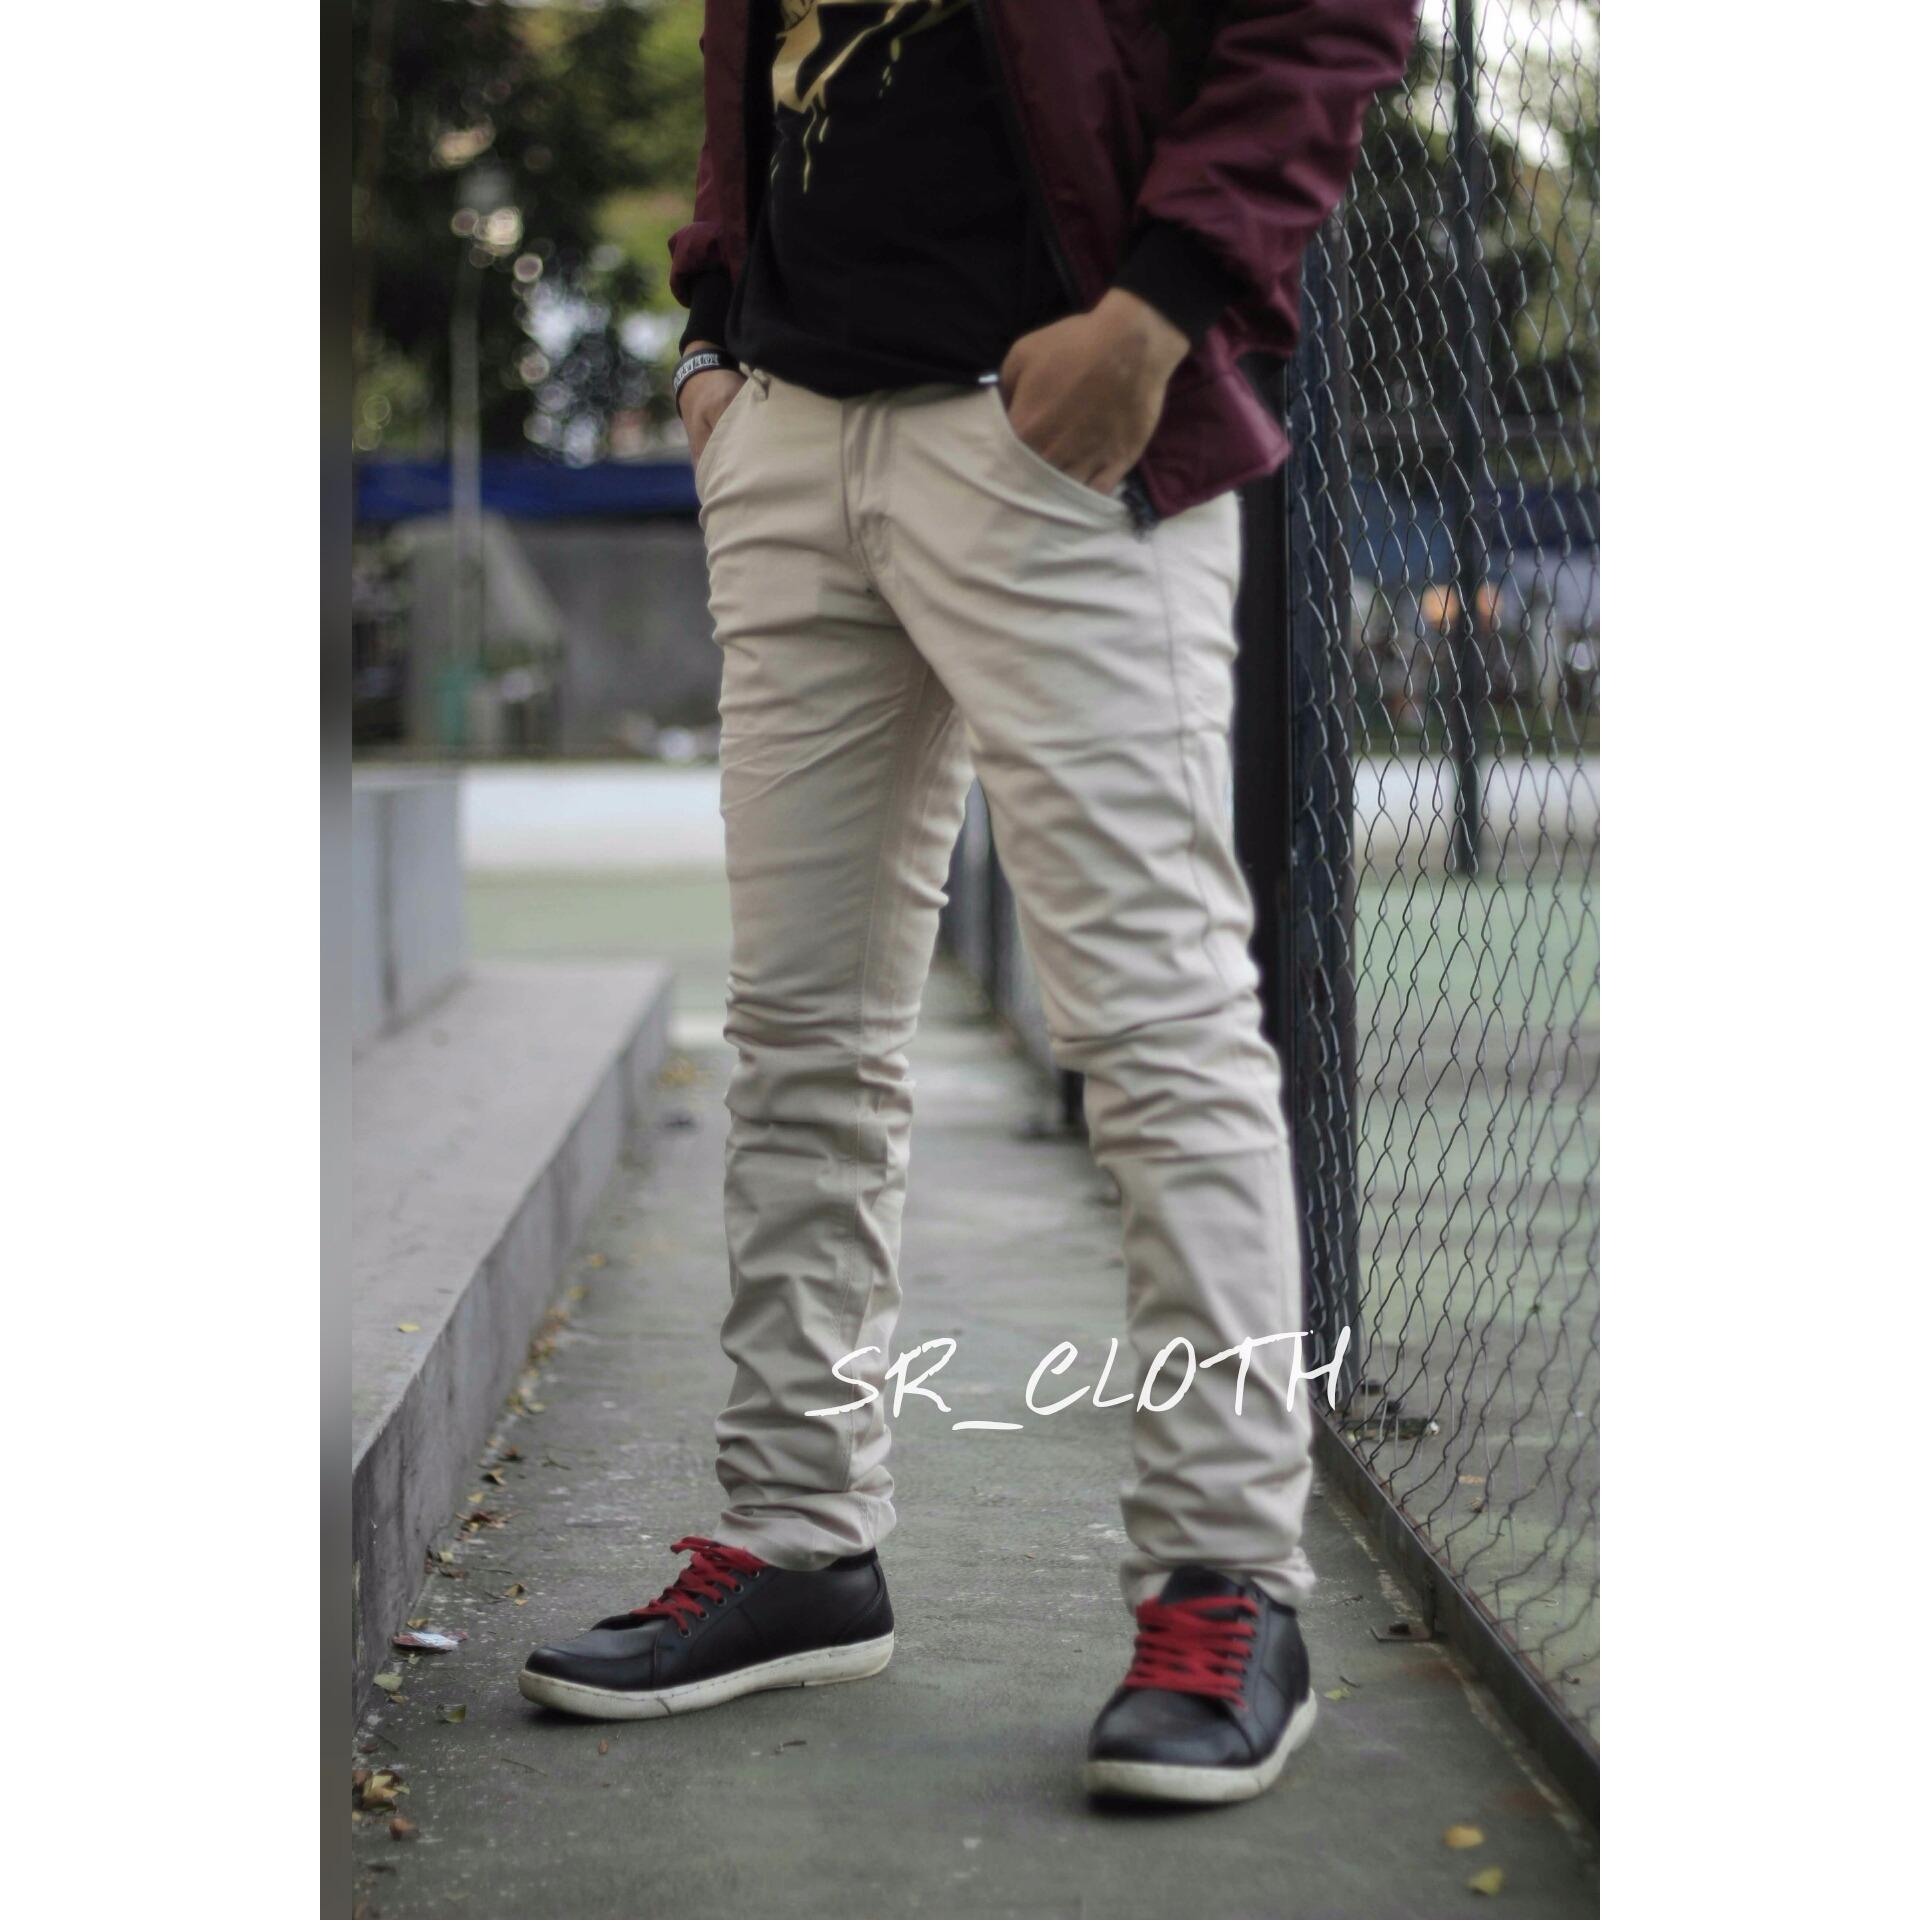 Celana Panjang Pria Chino Pocket Mocca Crem Hitam Premium Sr Cloth Diskon 50